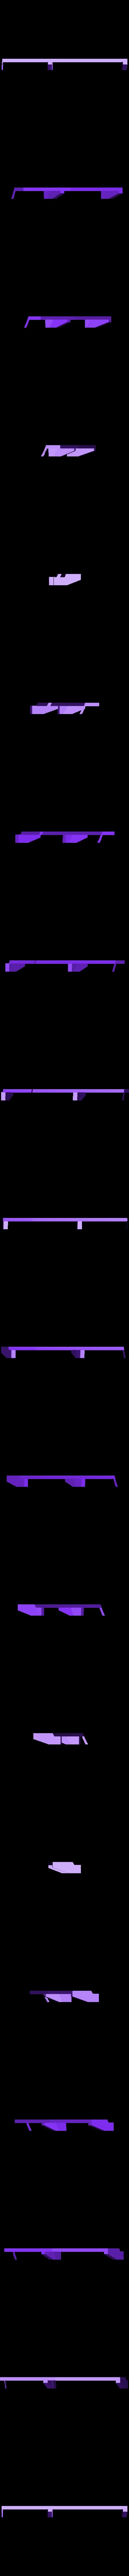 Run_Board_Front-B.STL Download free STL file 4-8-8-4 Big Boy Locomotive • 3D printer object, RaymondDeLuca